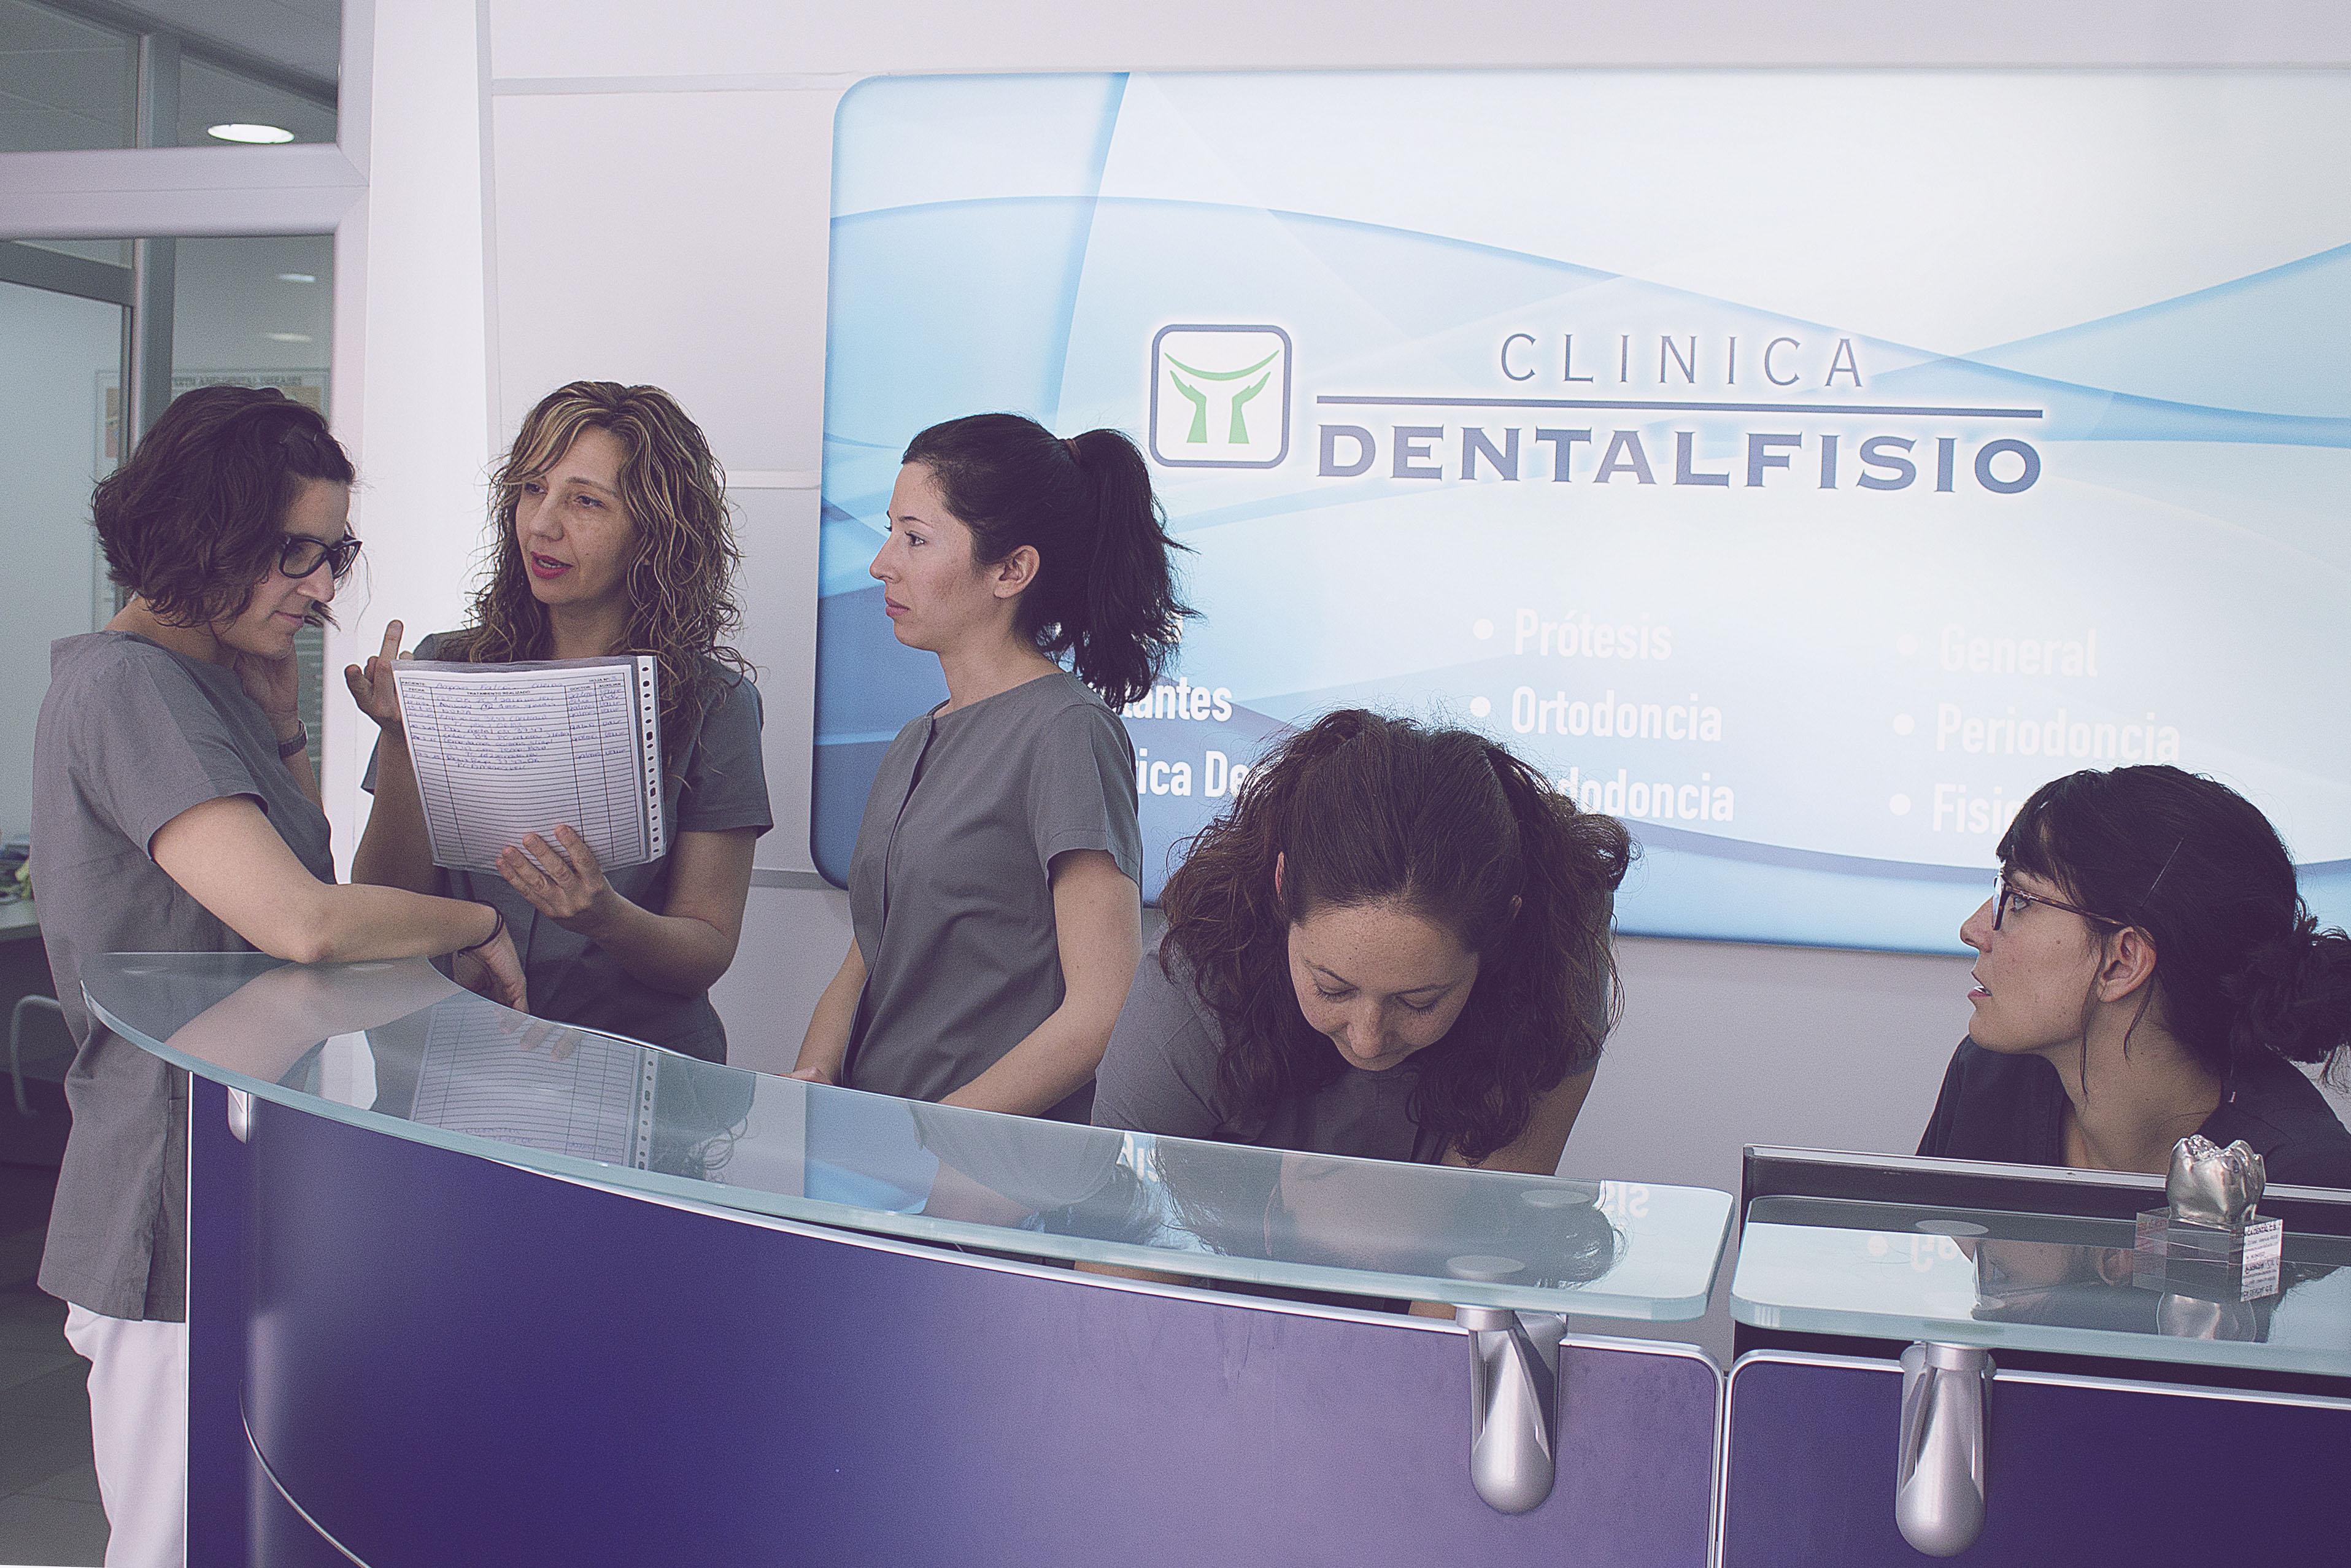 clinica dental valencia, dentistas en burjassot, clínica dental burjassot, clinica dental en burjassot